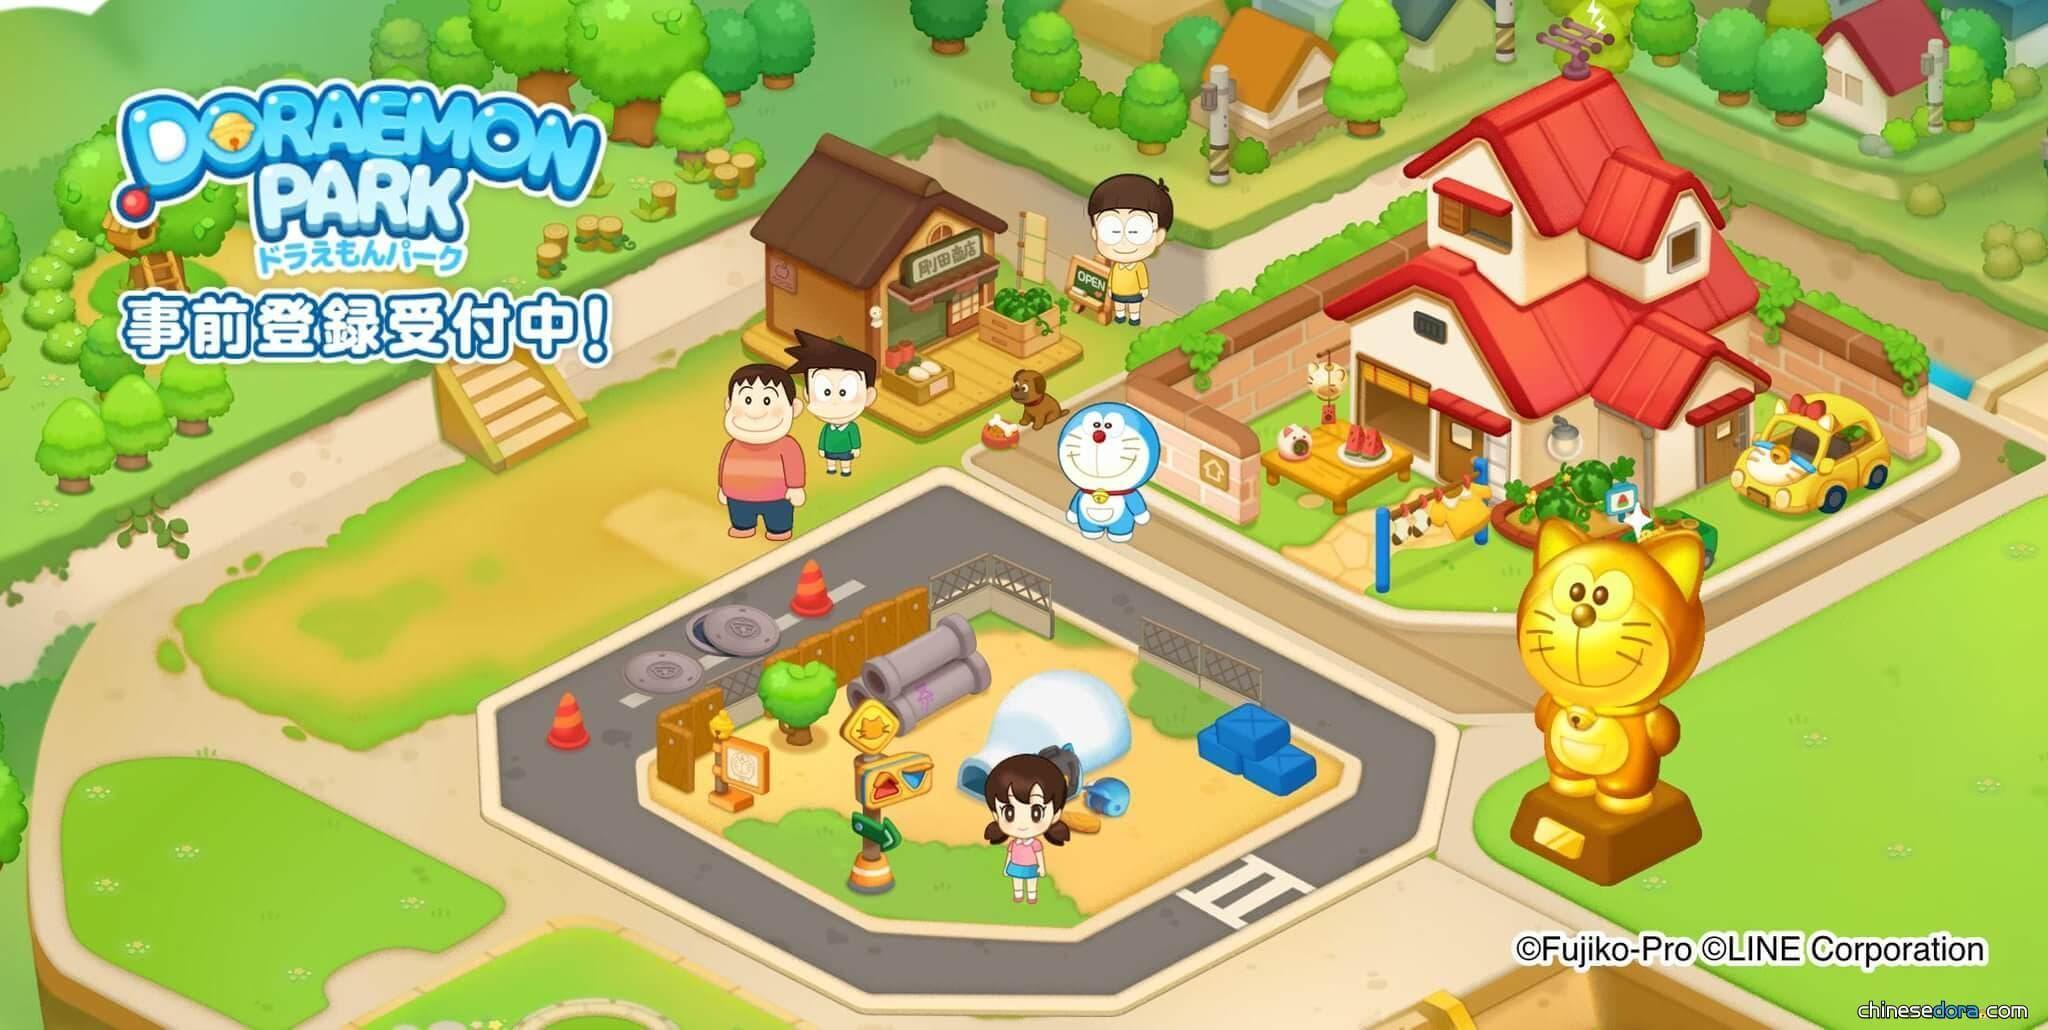 [LINE] 與哆啦A夢一起玩轉珠蓋公園! LINE遊戲「哆啦A夢公園」